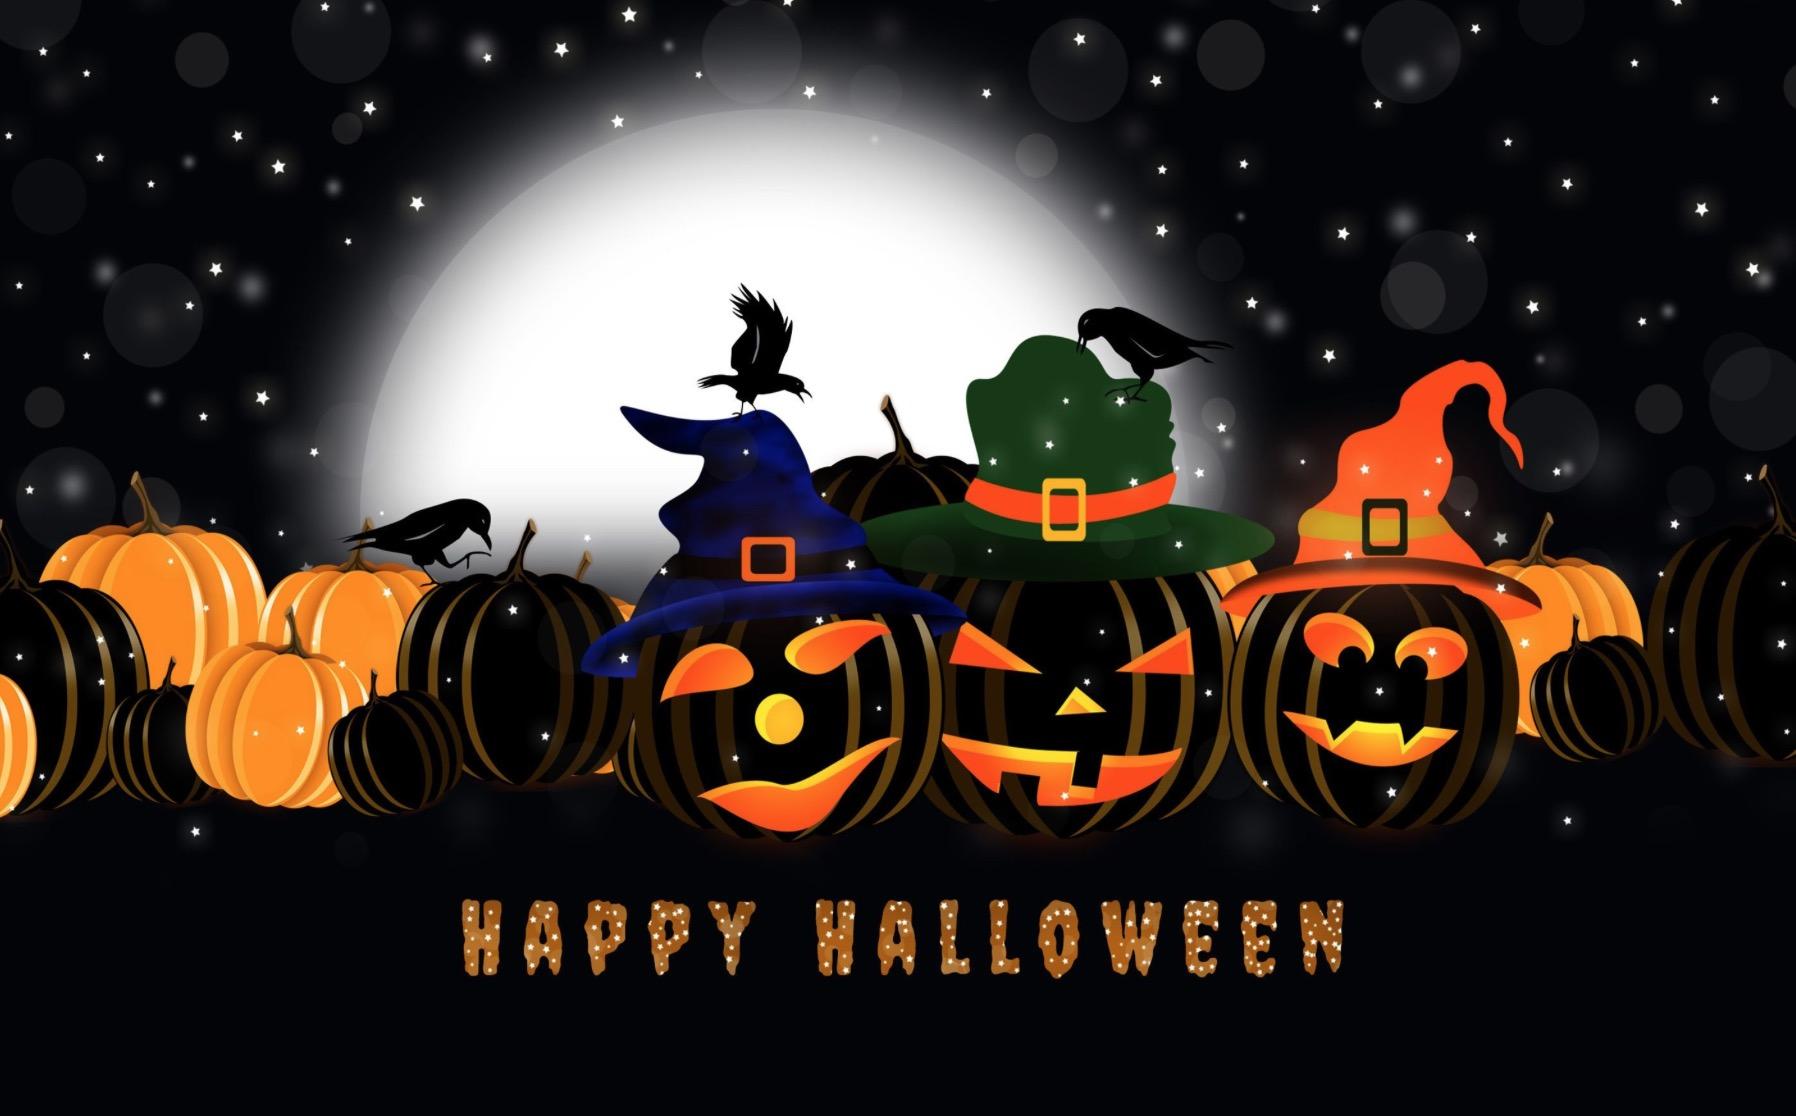 Happy Halloween WhatsApp